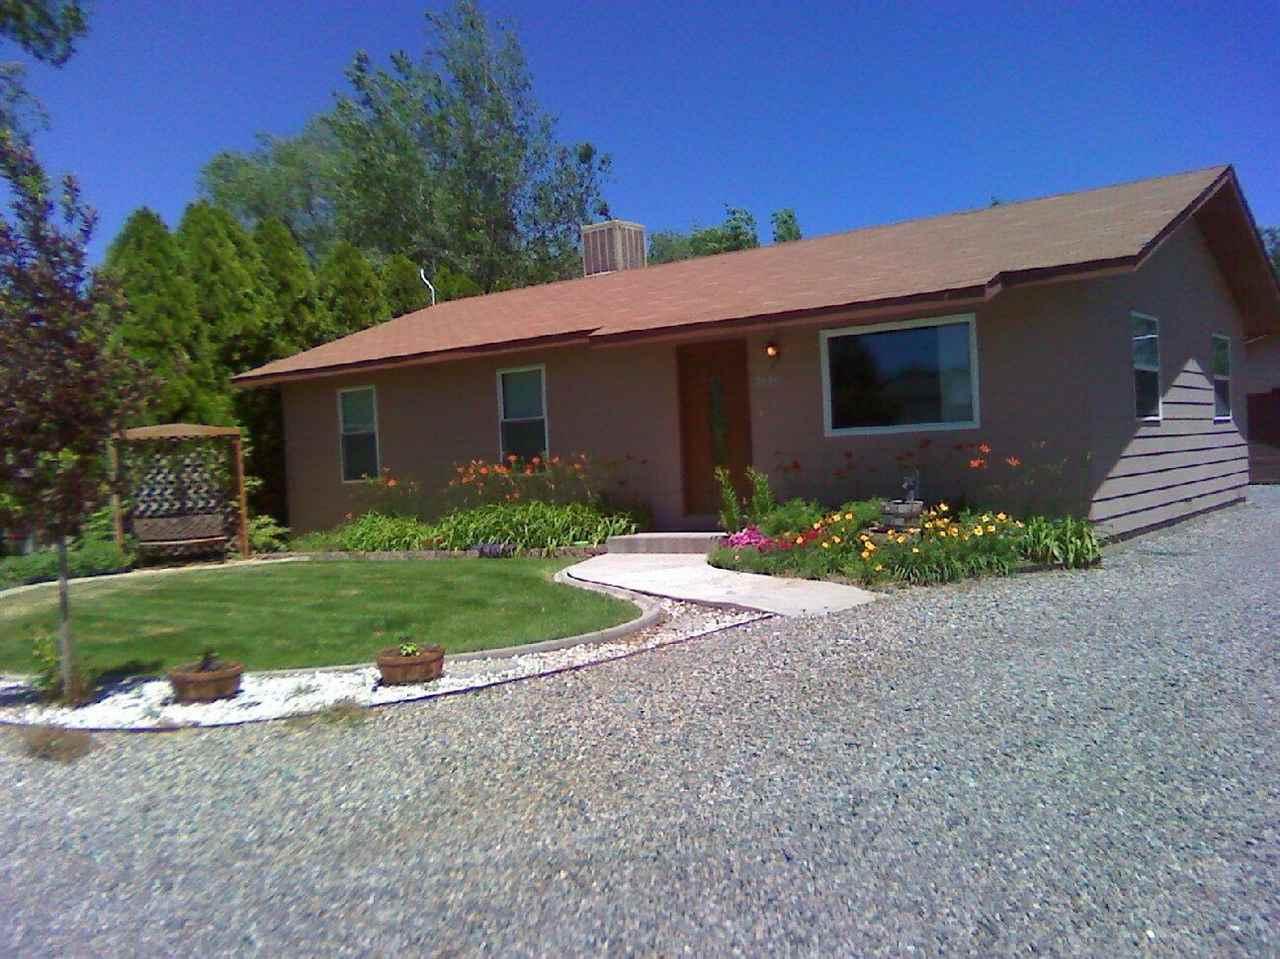 282 1/2 Holly Lane, Grand Junction, CO 81503